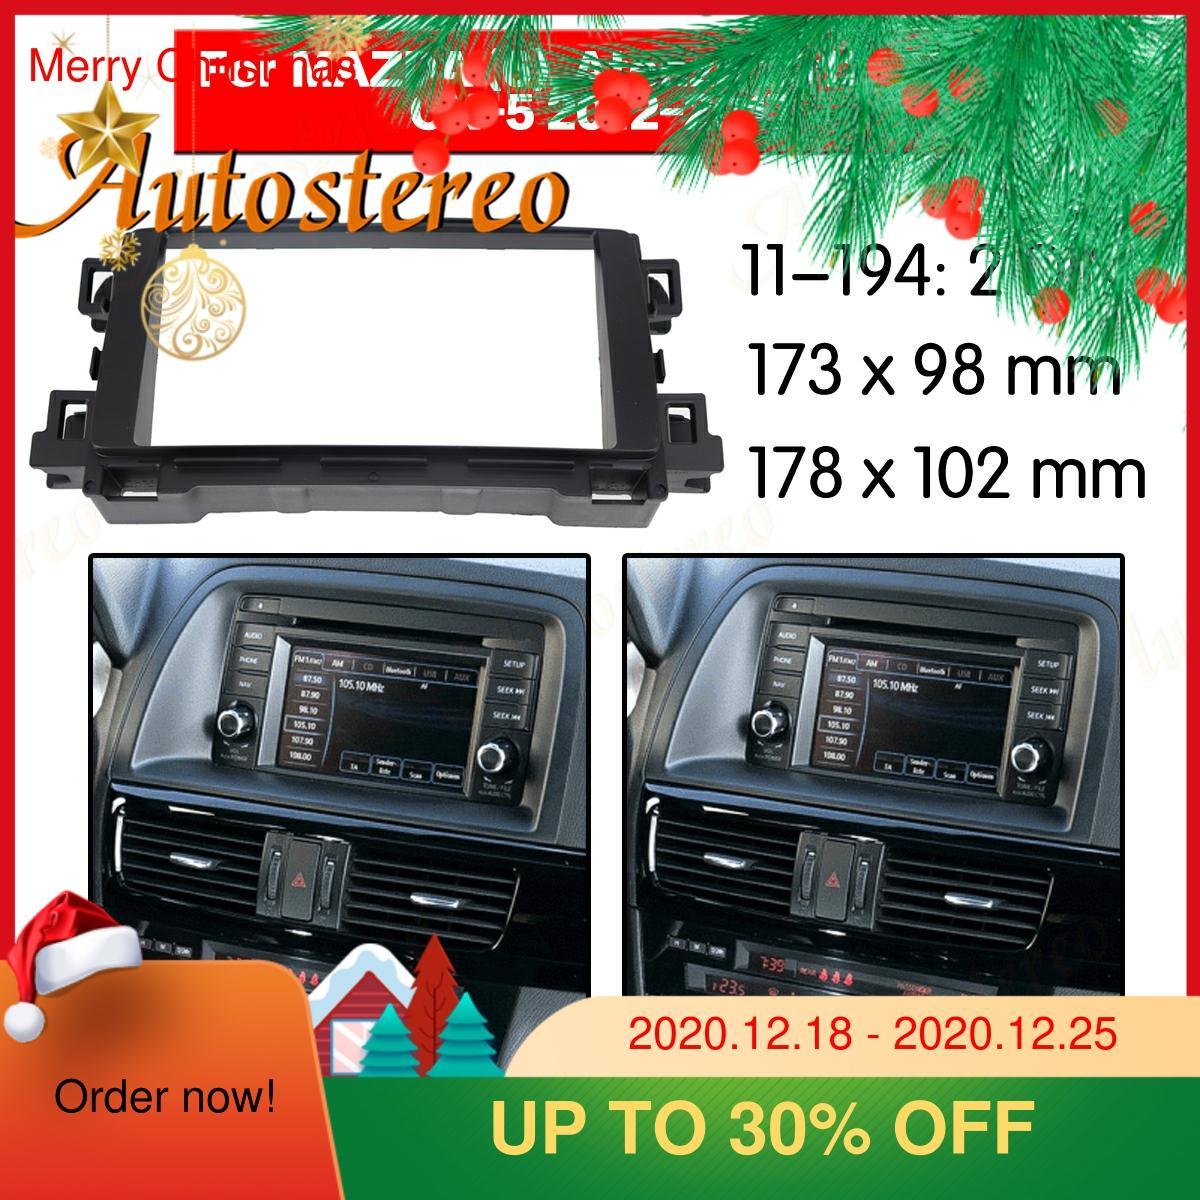 Frame Panel Frame Panel Top Radio Fascia for 2012+ Mazda CX 5/ Atenza/ Mazda 6 Stereo Fascia Dash CD Trim Installation Frame Kit Fascias  - AliExpress